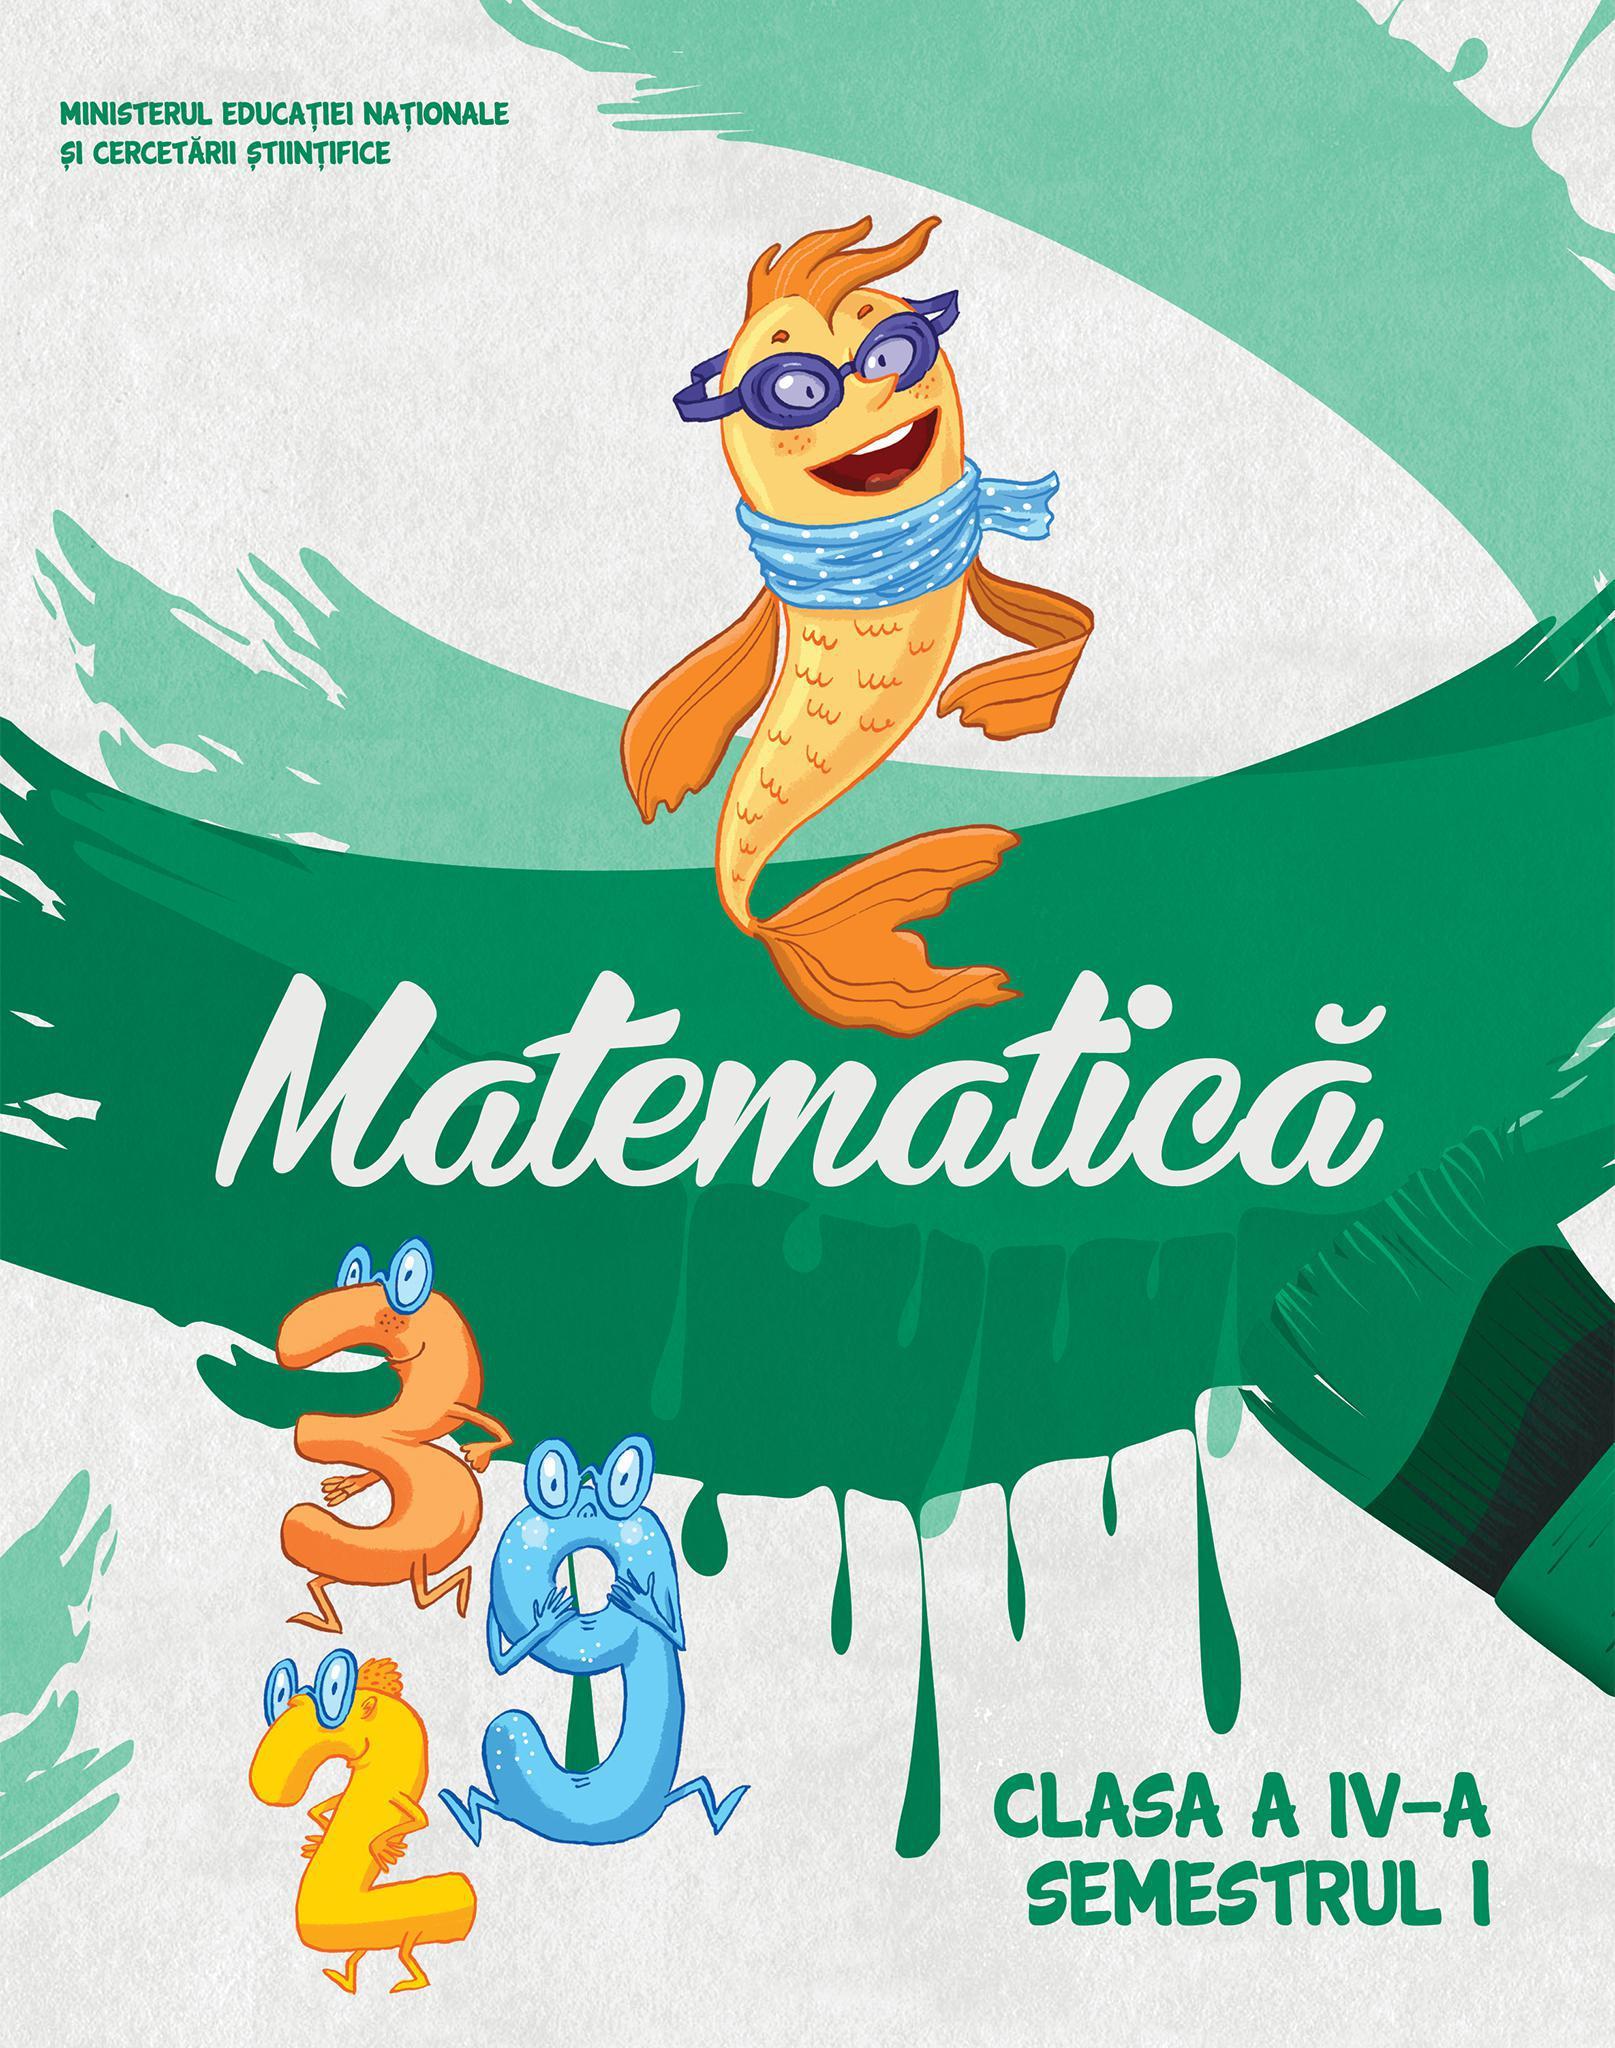 Matematica pt cei mici